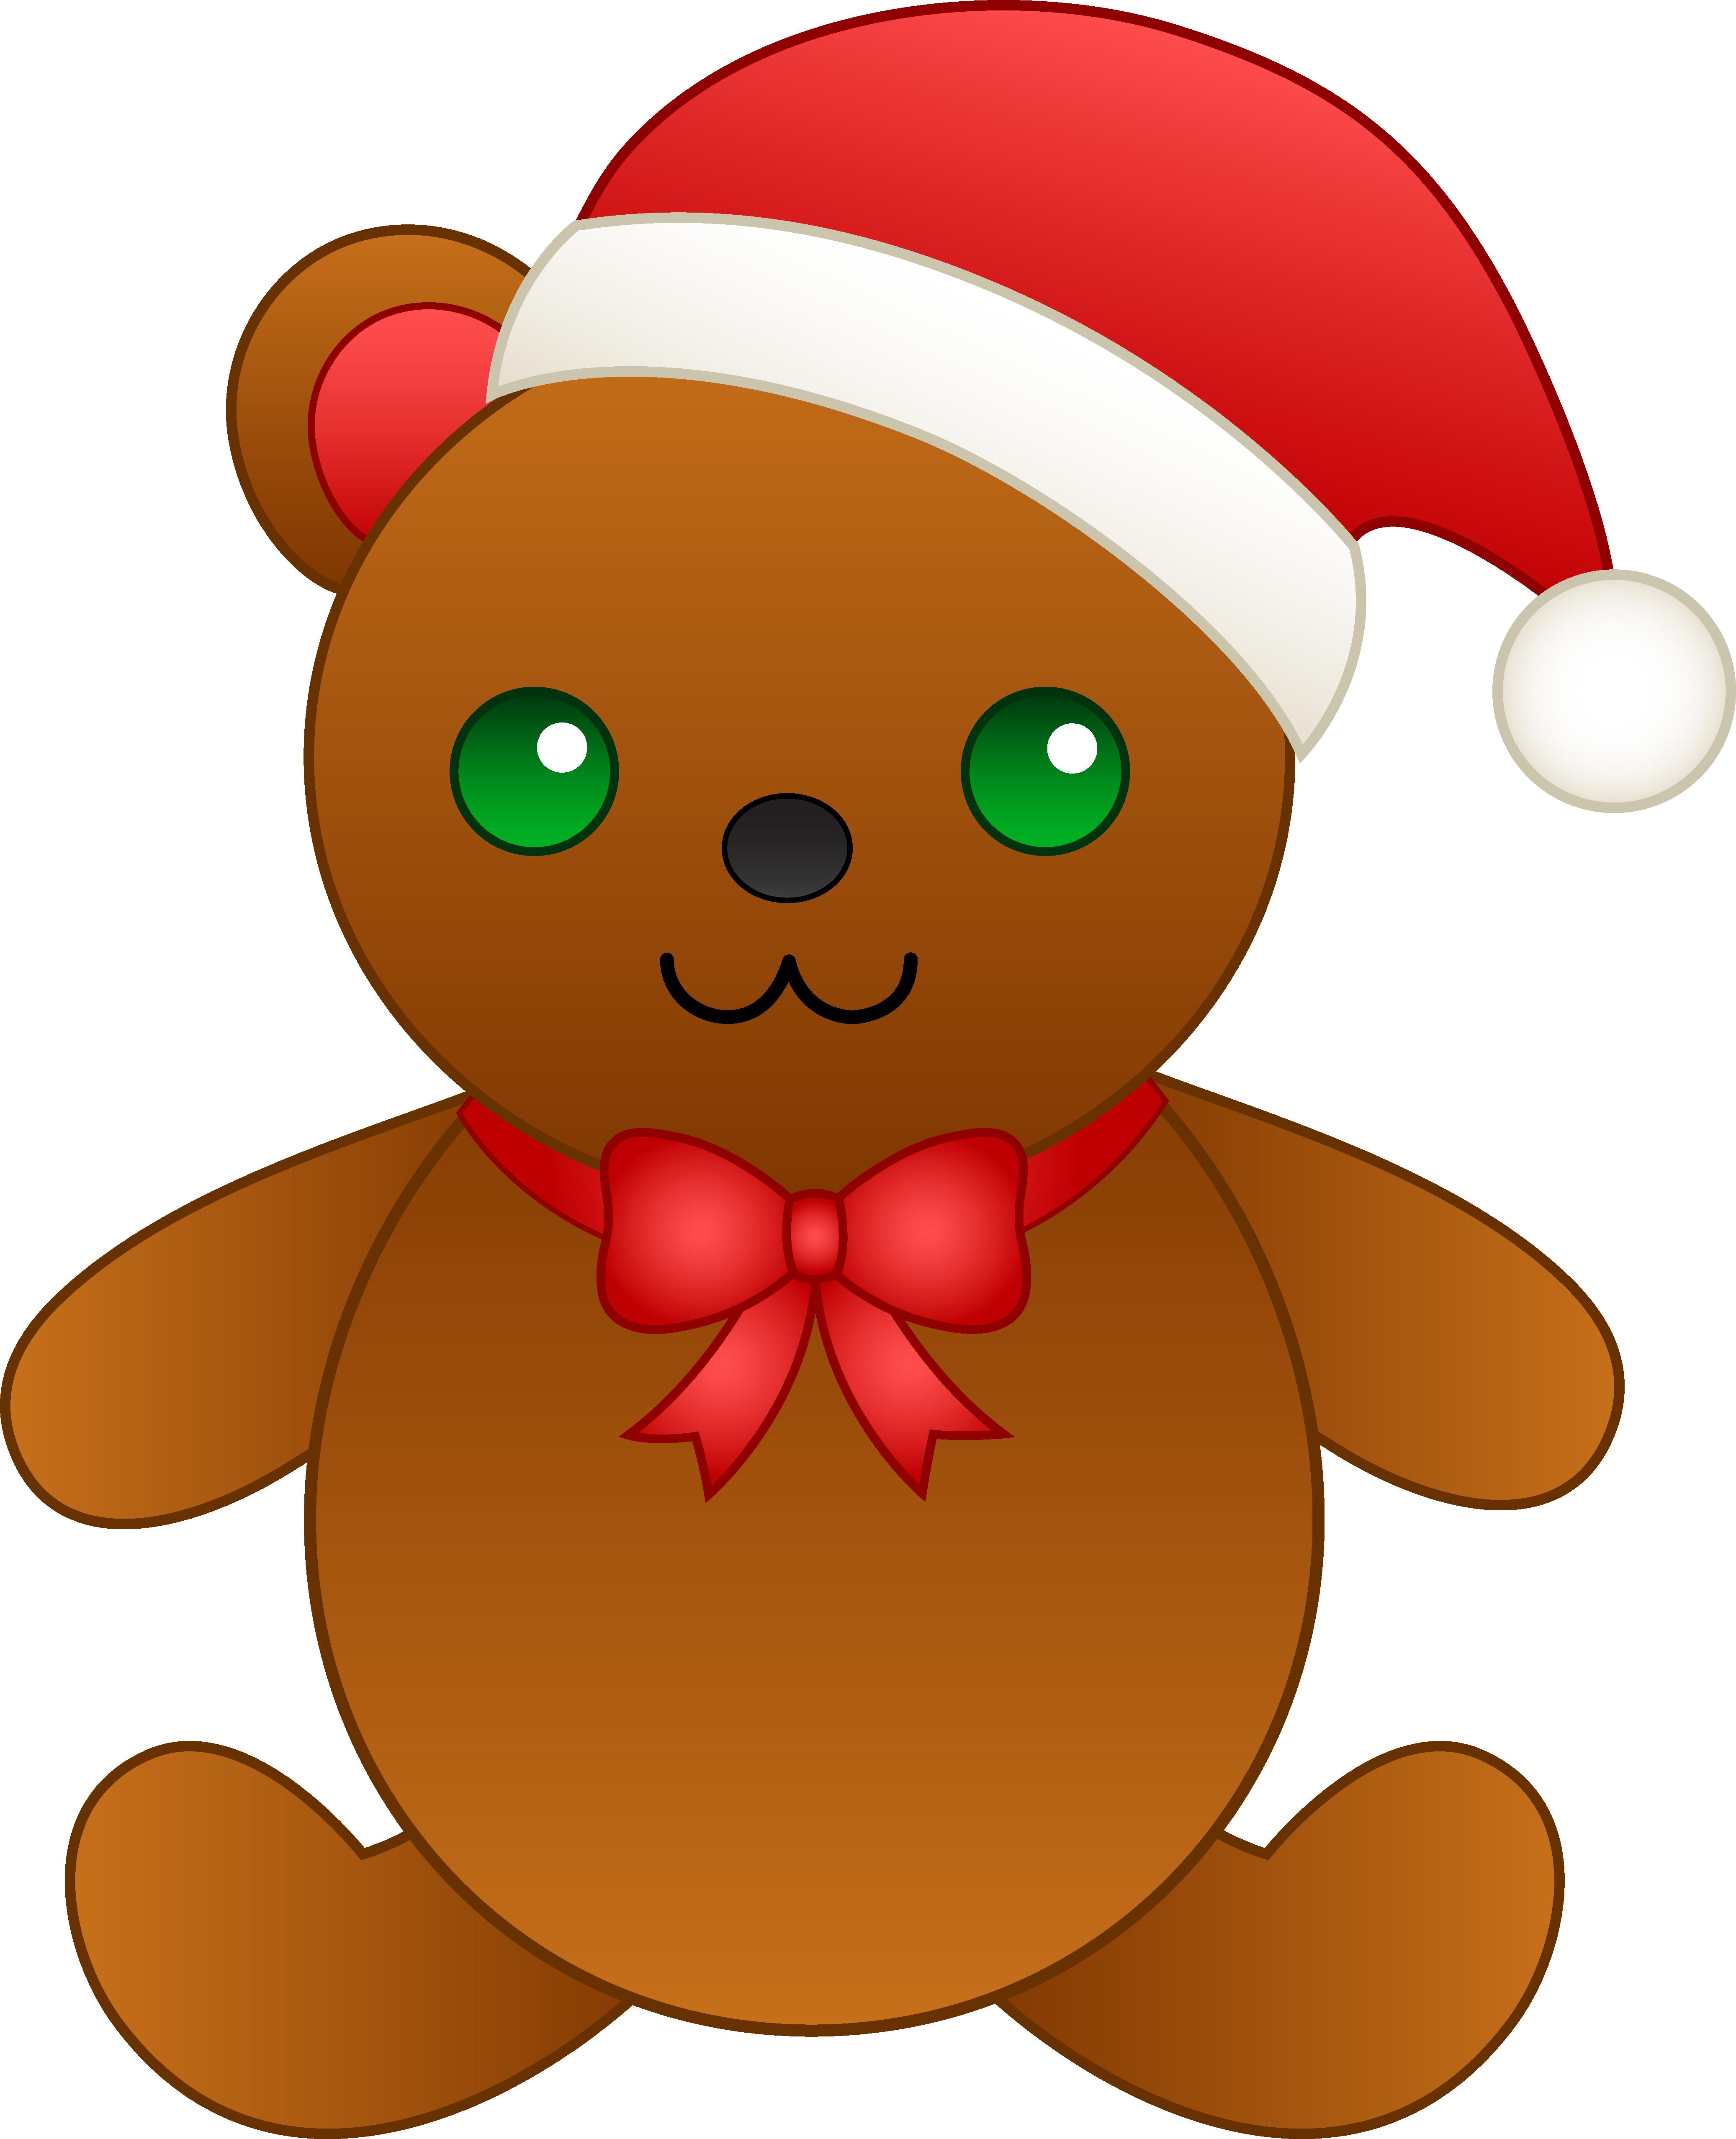 Christmas teddy bear with. Gingerbread clipart santa hat